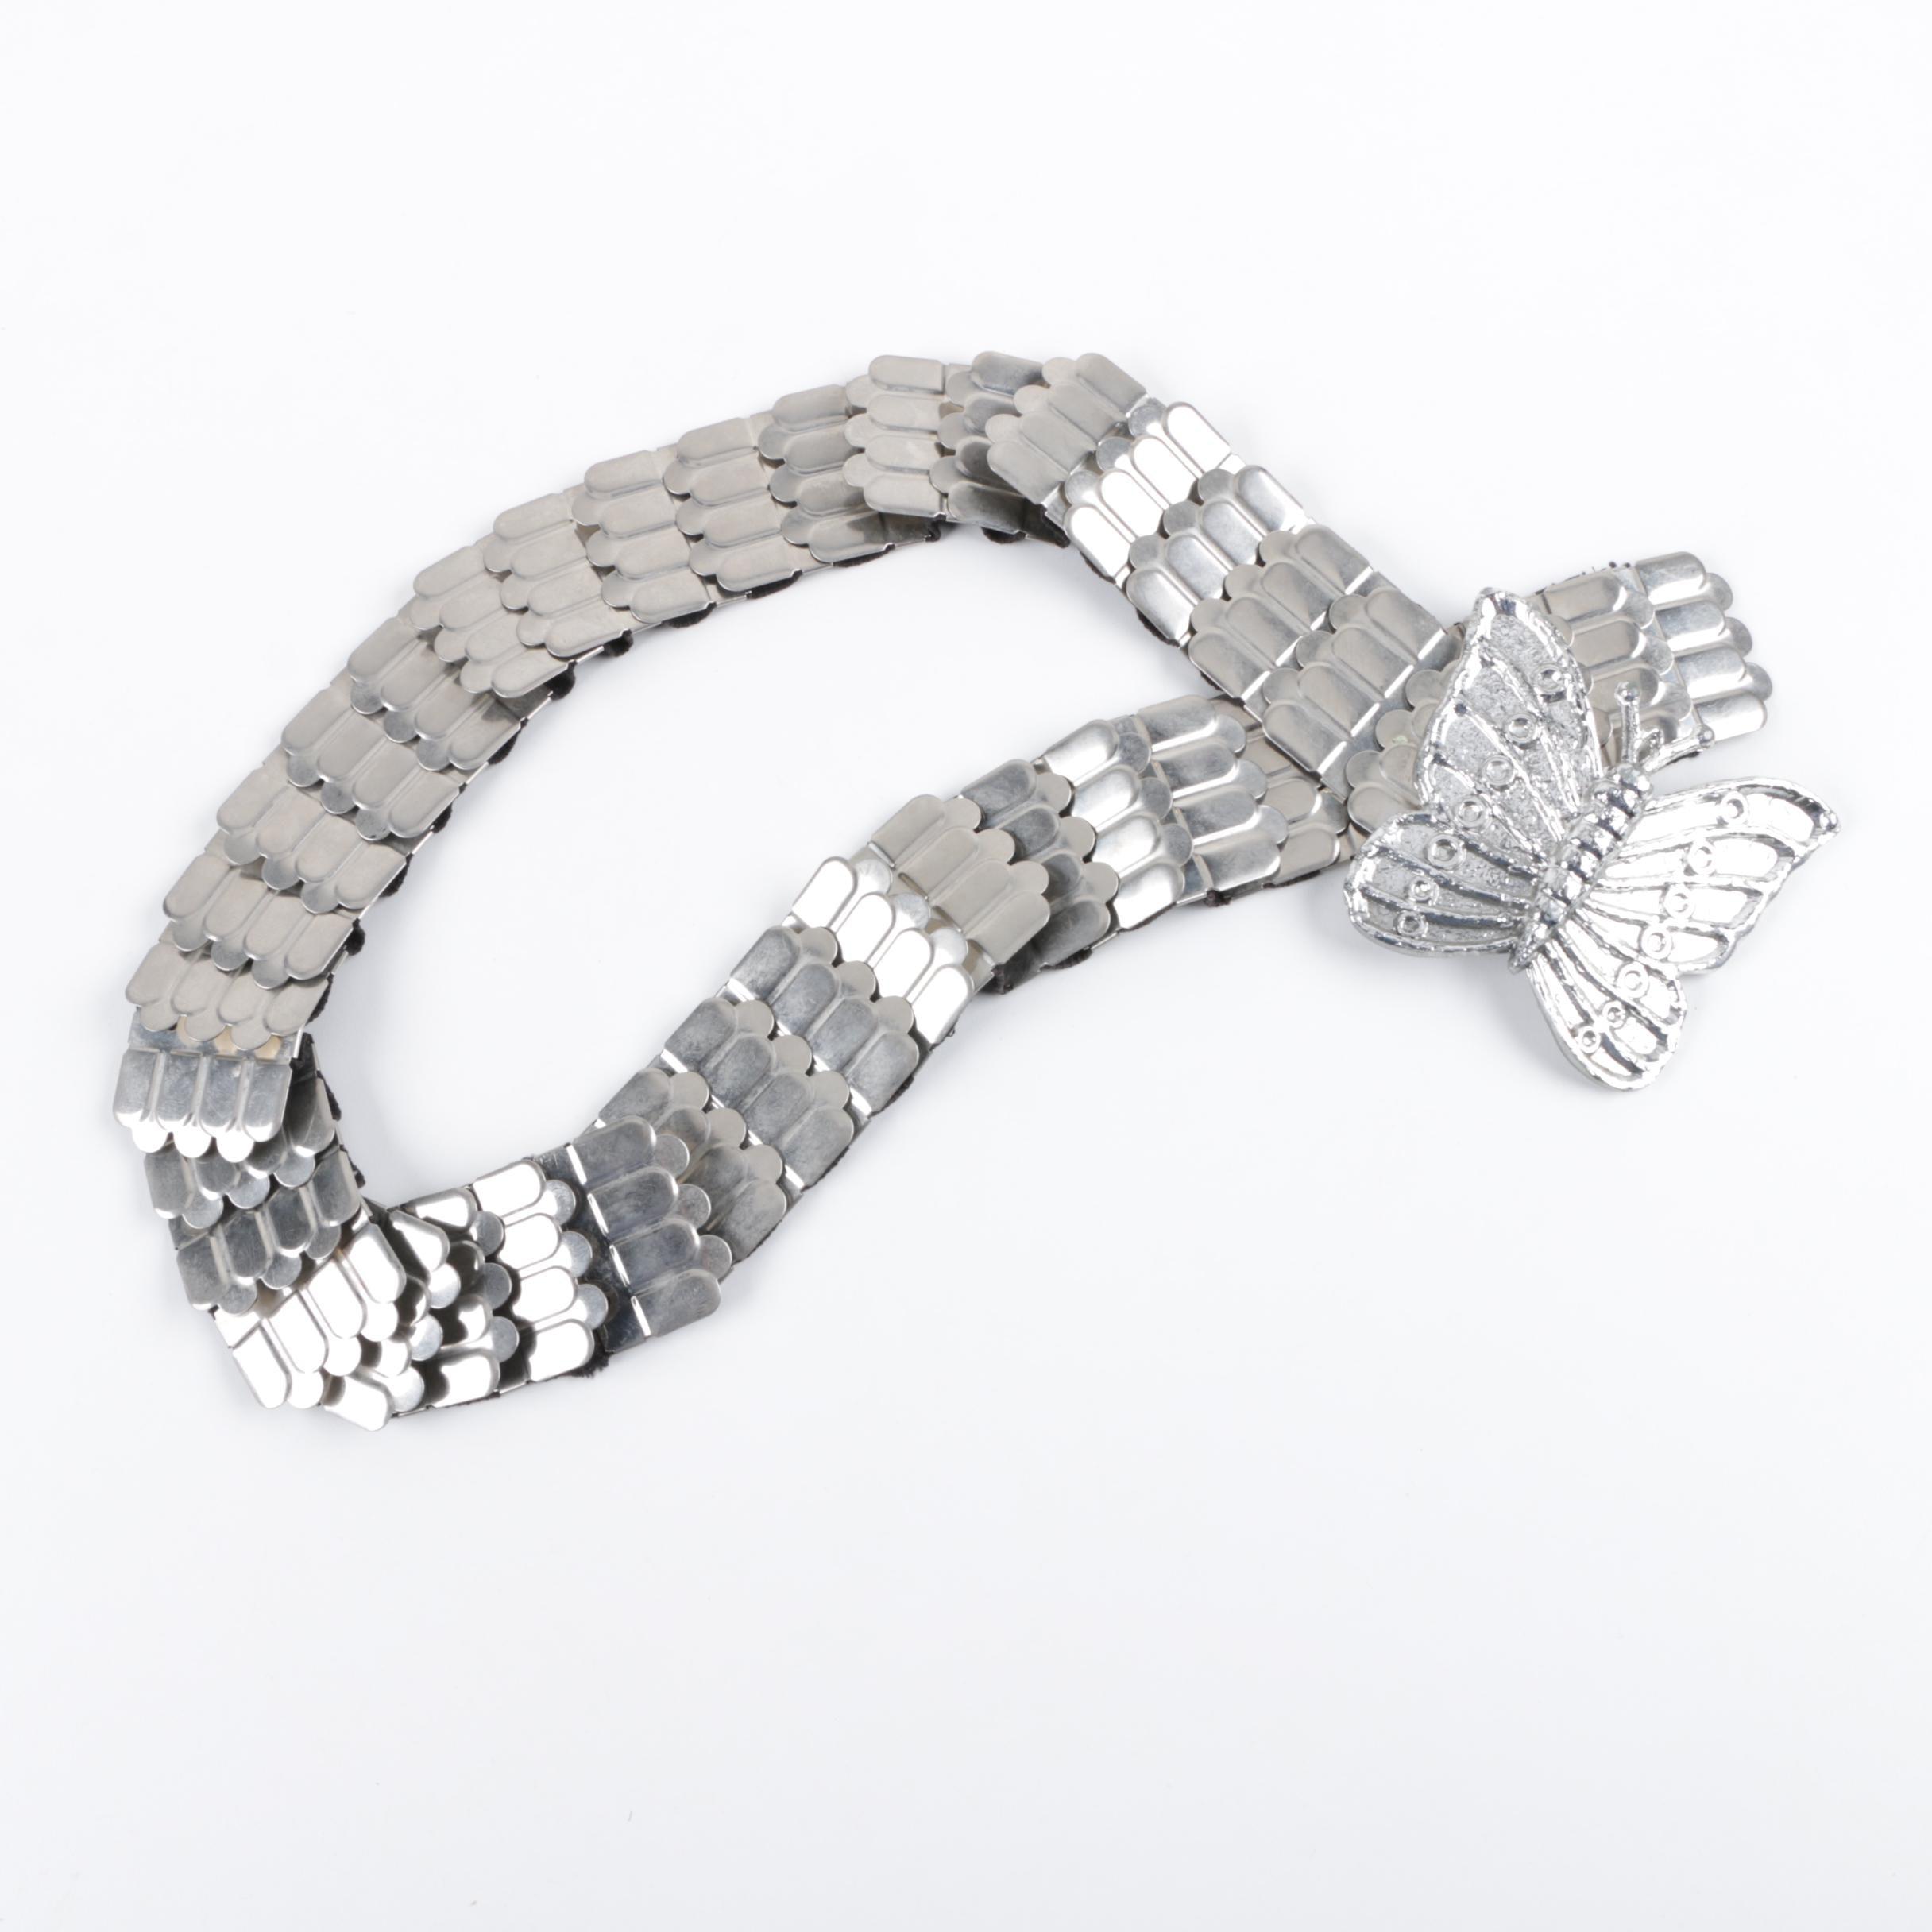 Vintage Silver Tone Stretch Butterfly Belt